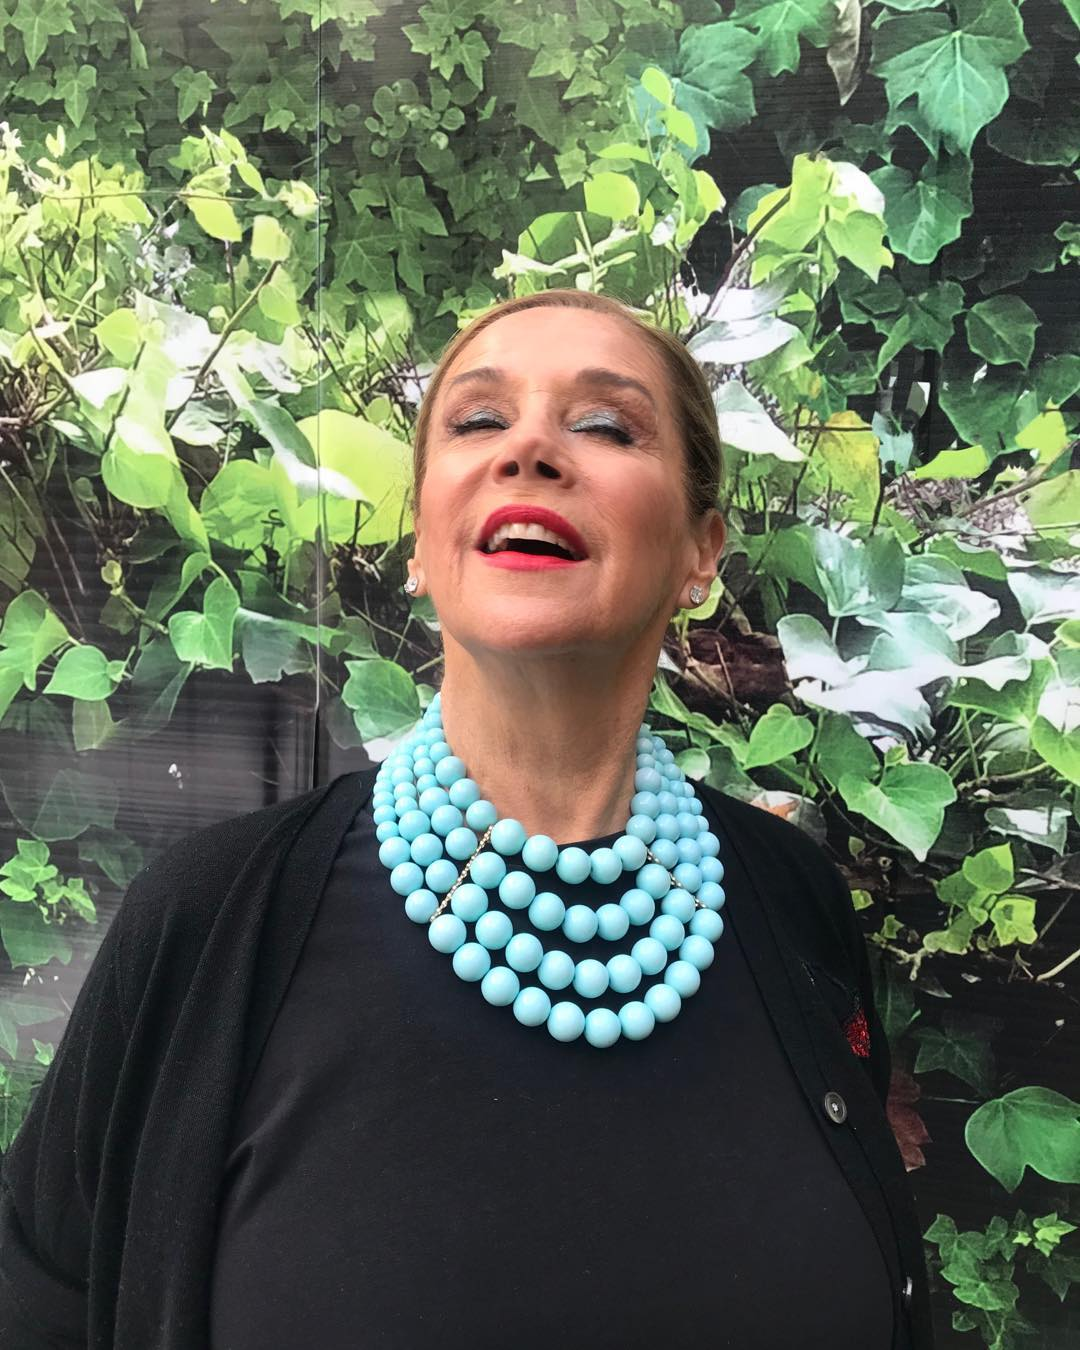 Marcela Tinayre le respondió a Jorge Rial